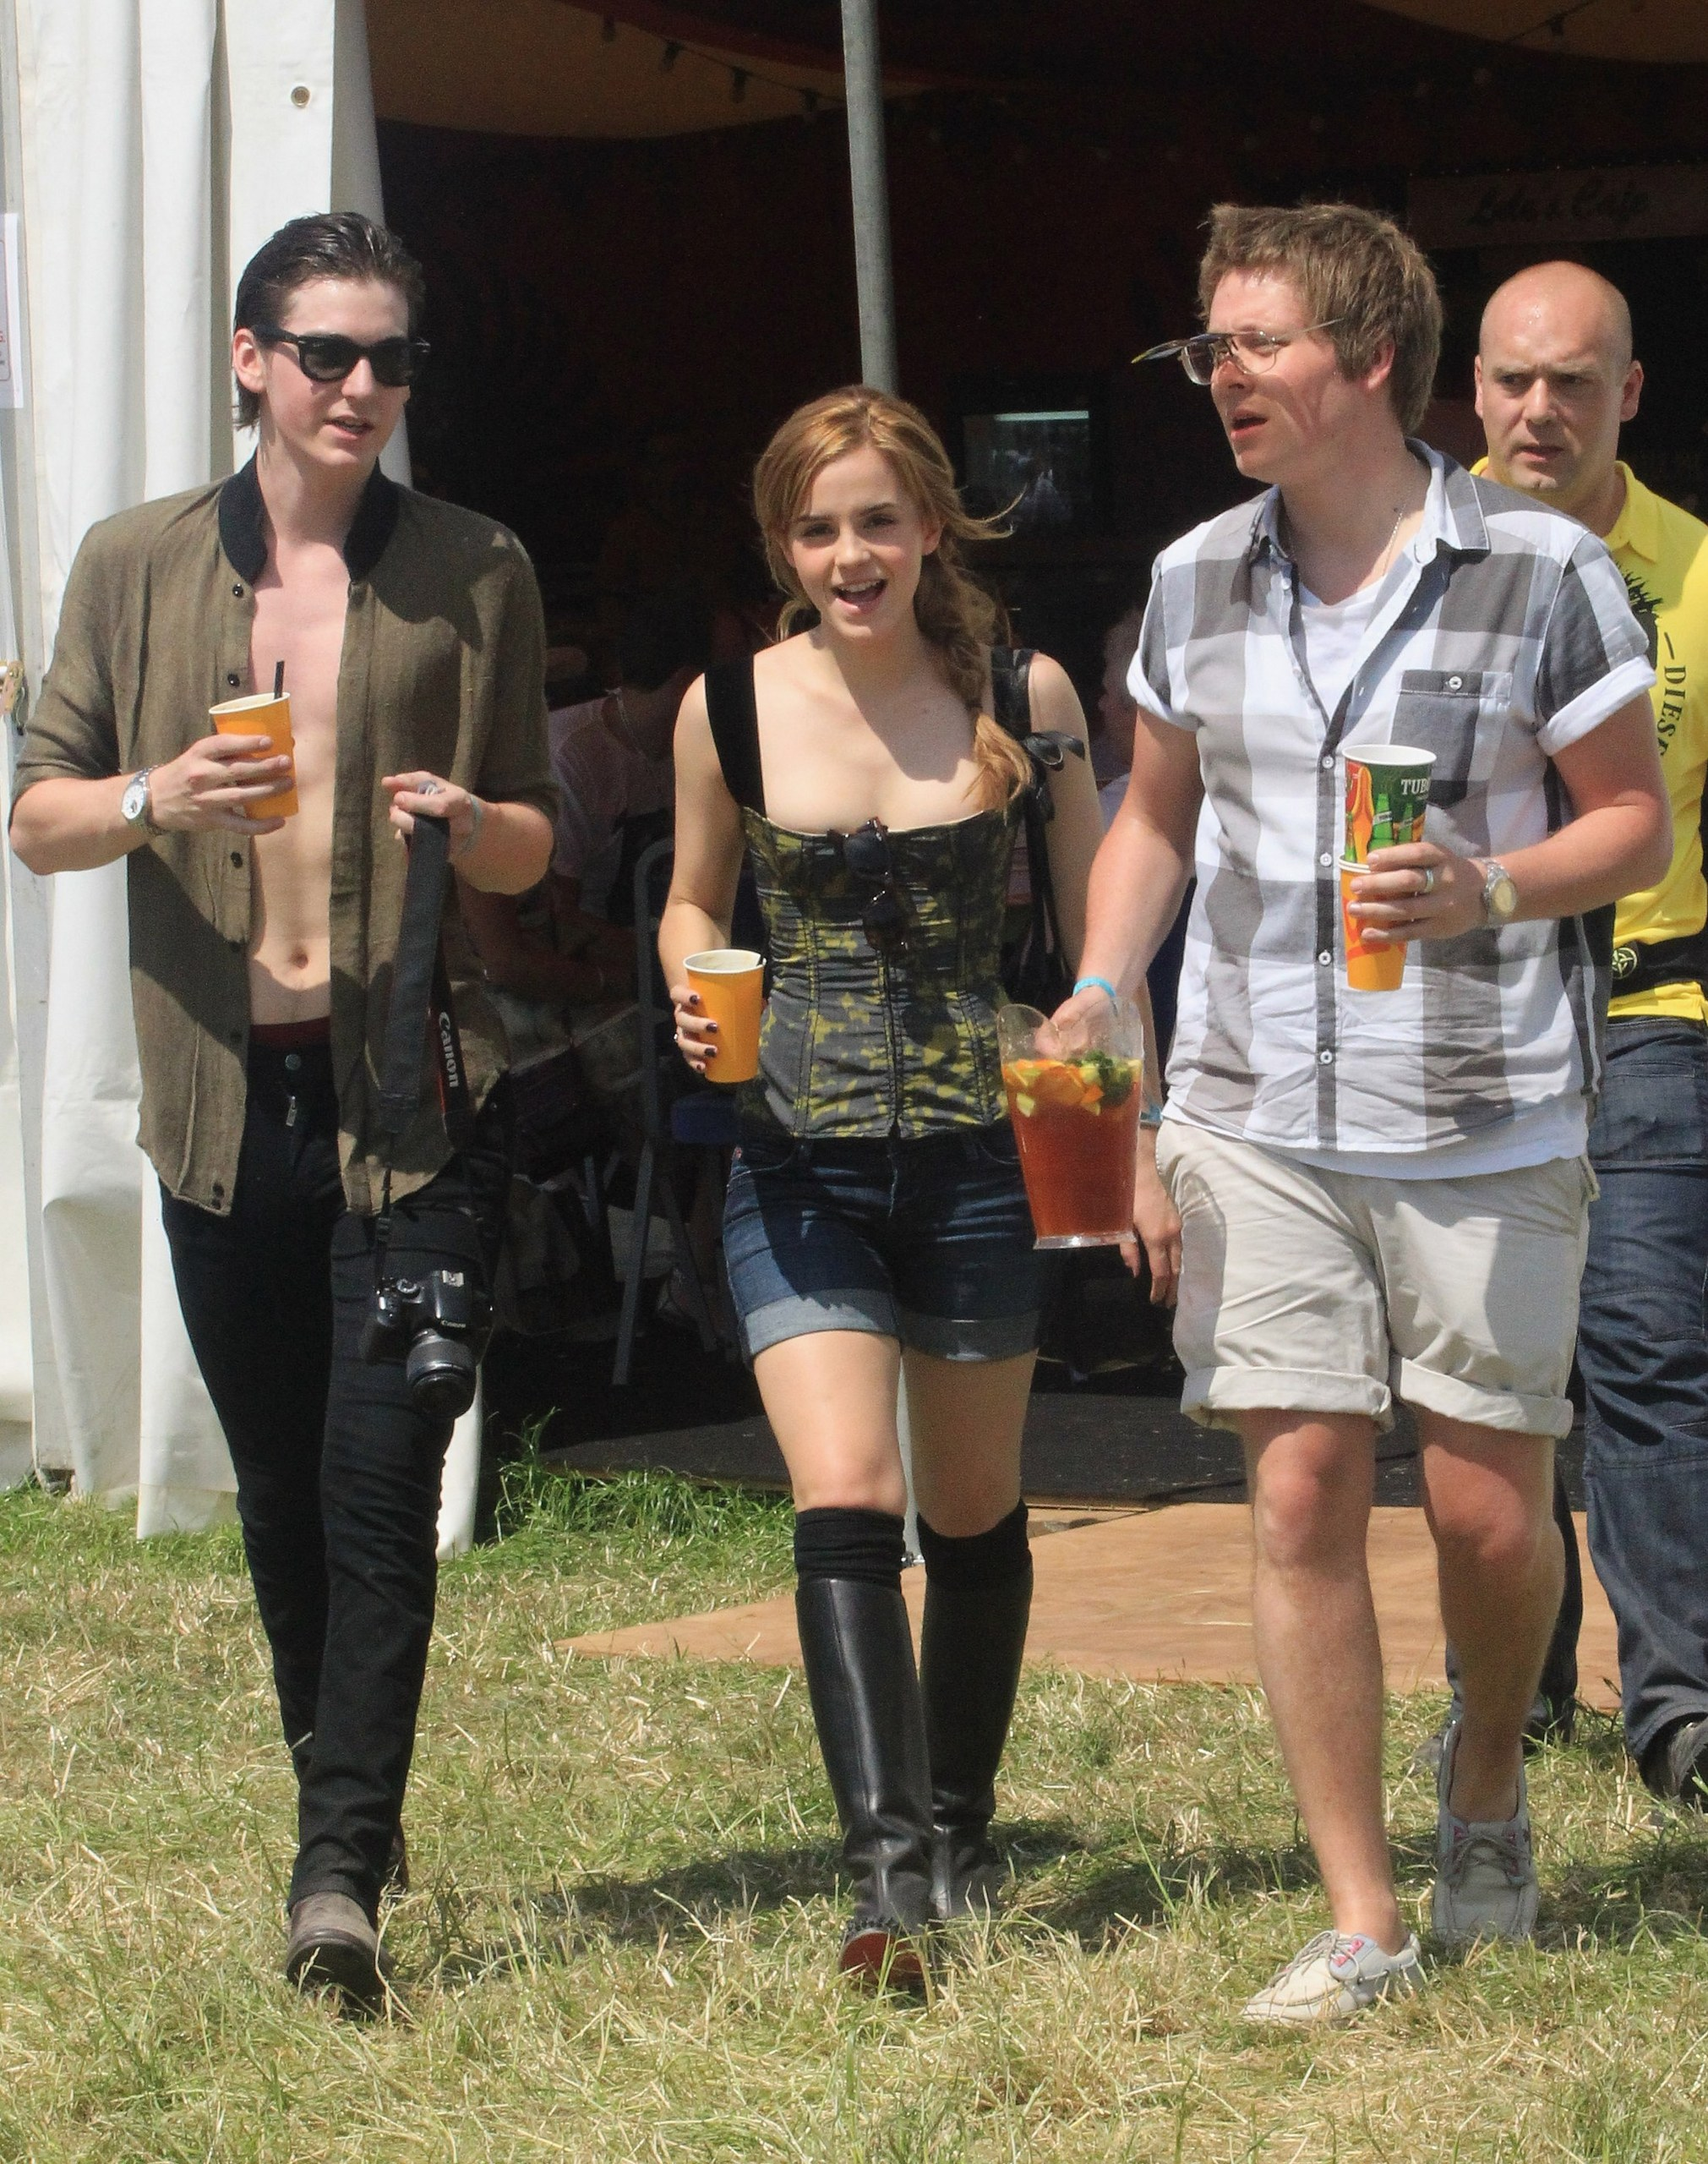 2010 Glastonbury Musik Festival in Somerset, England (25.06.10) [HQ]